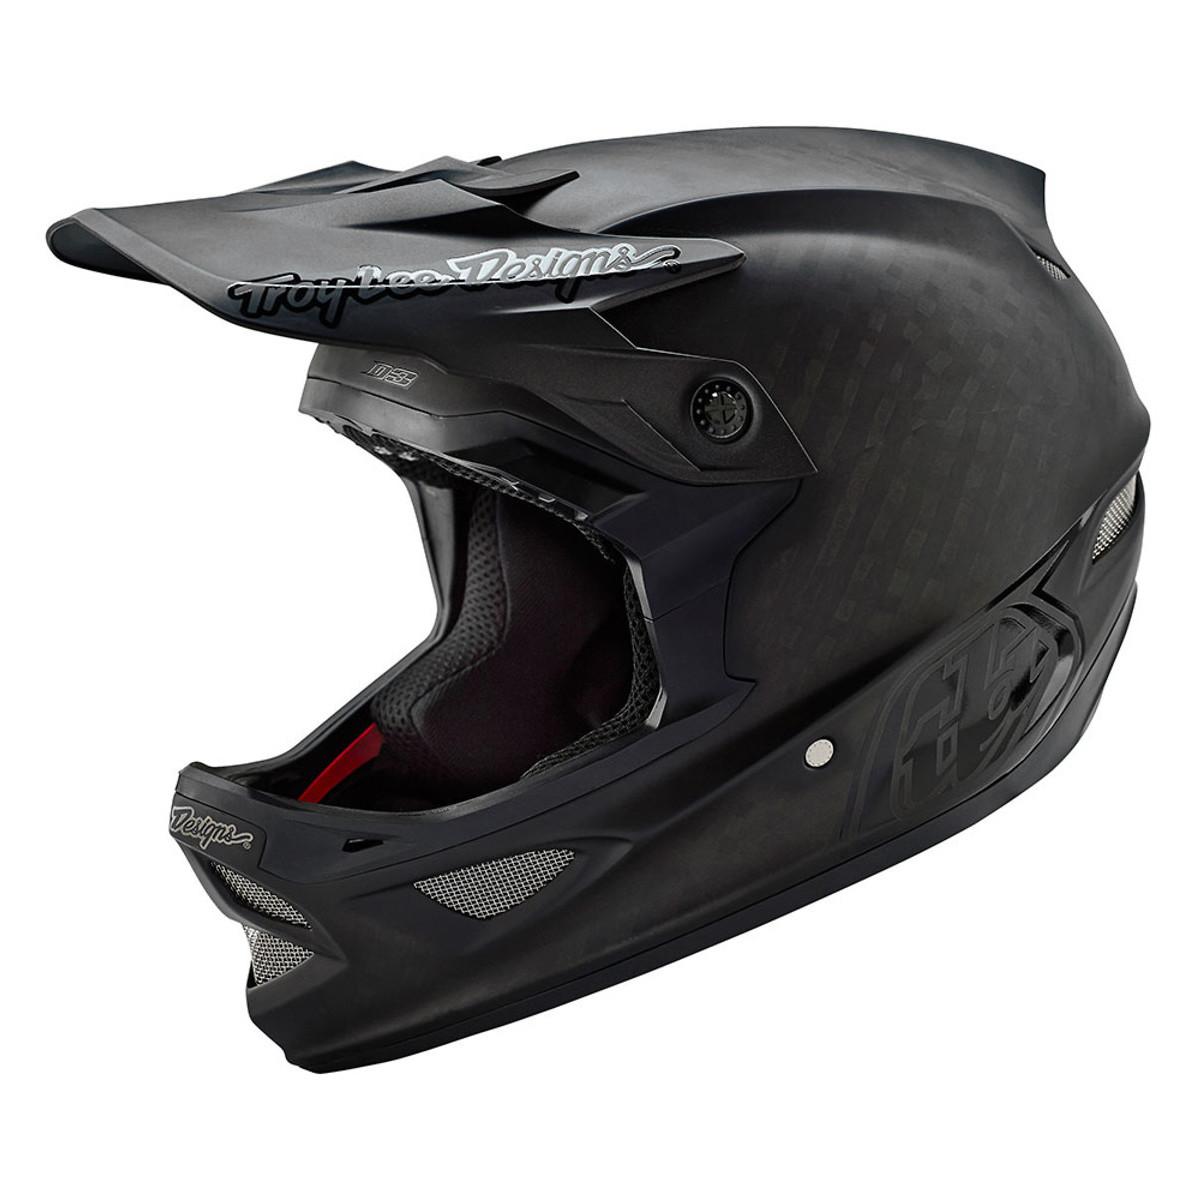 Troy Lee Designs D3 Carbon Full Face Helmet TLD D3 Carbon Helmet - Midnight Black